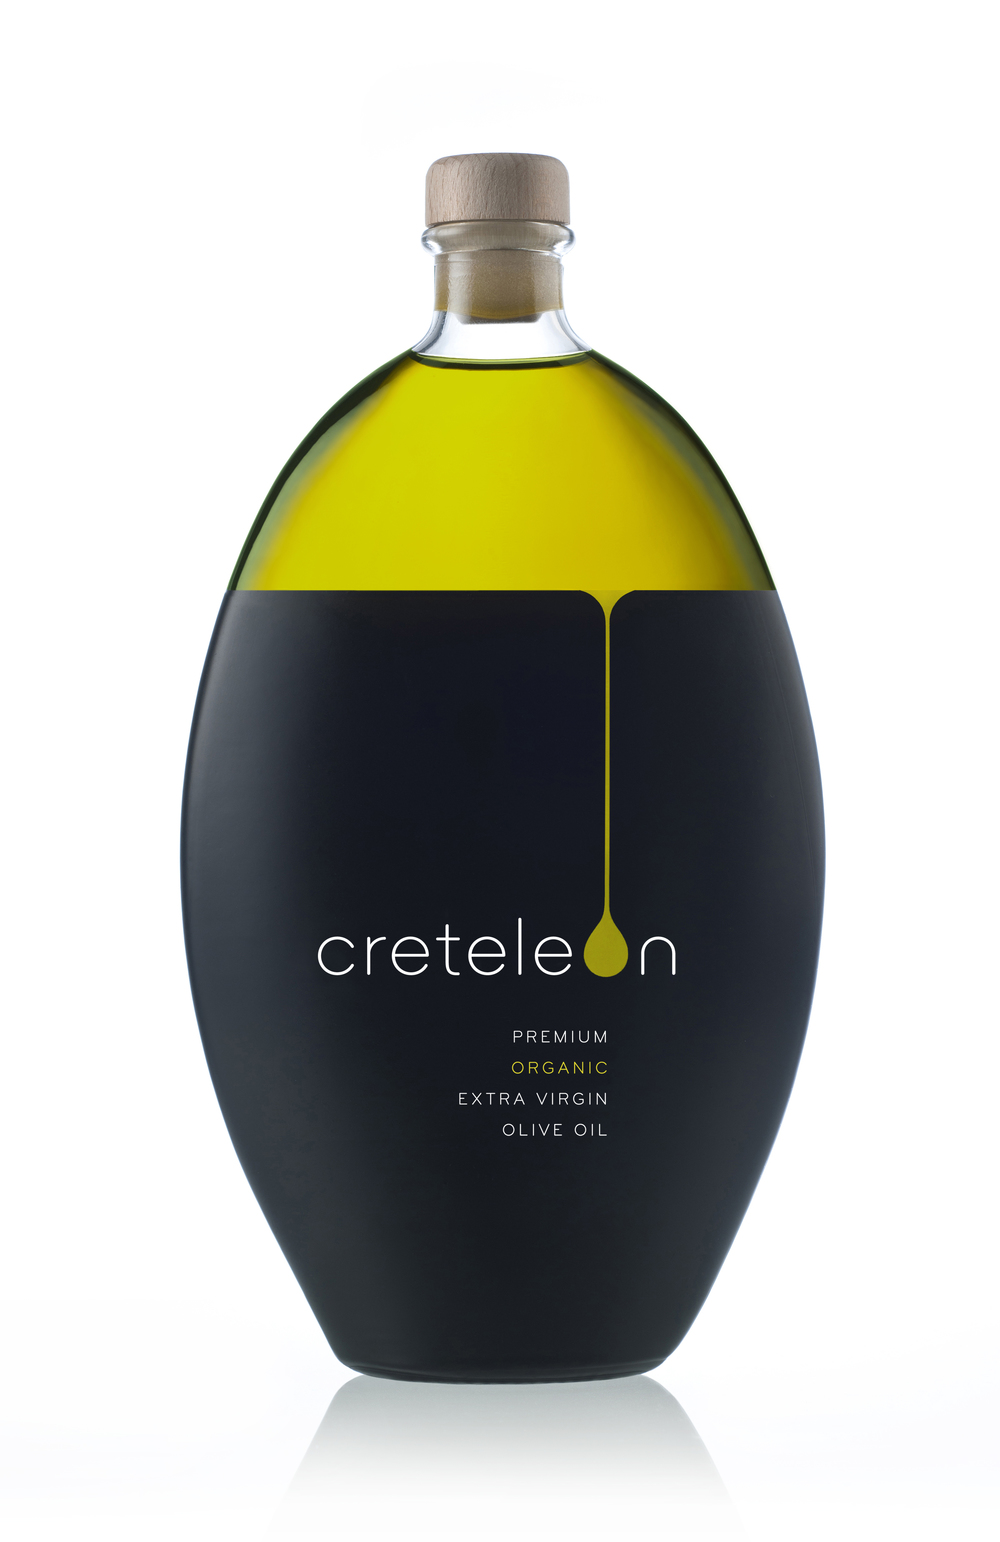 Creteleon-front.jpg